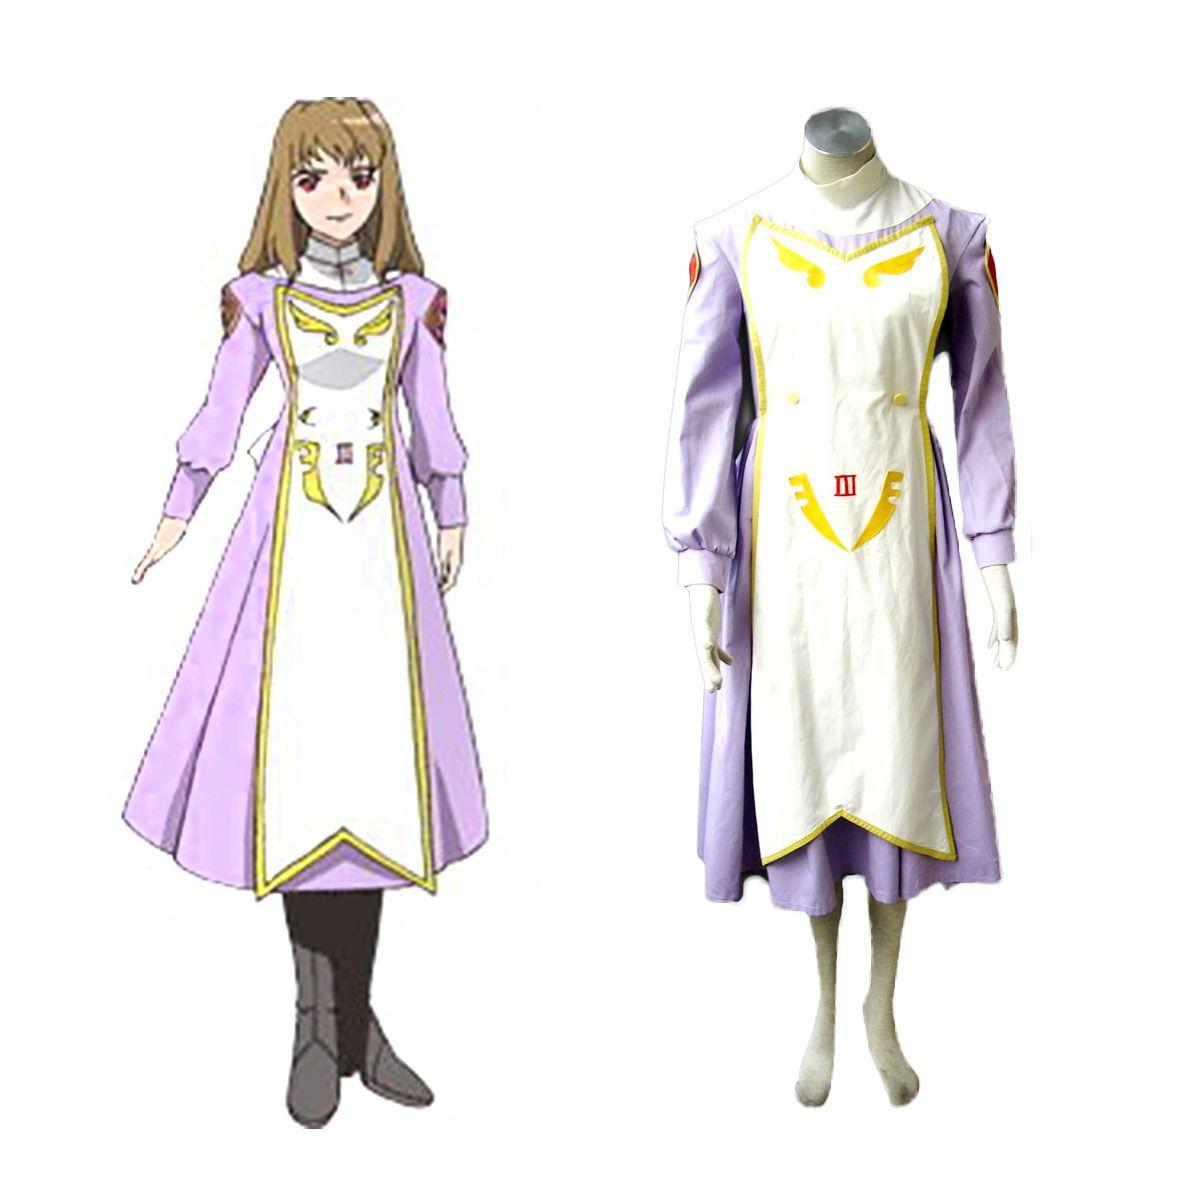 My-Otome Shizuru Viola Cosplay Costumes Deluxe Edition